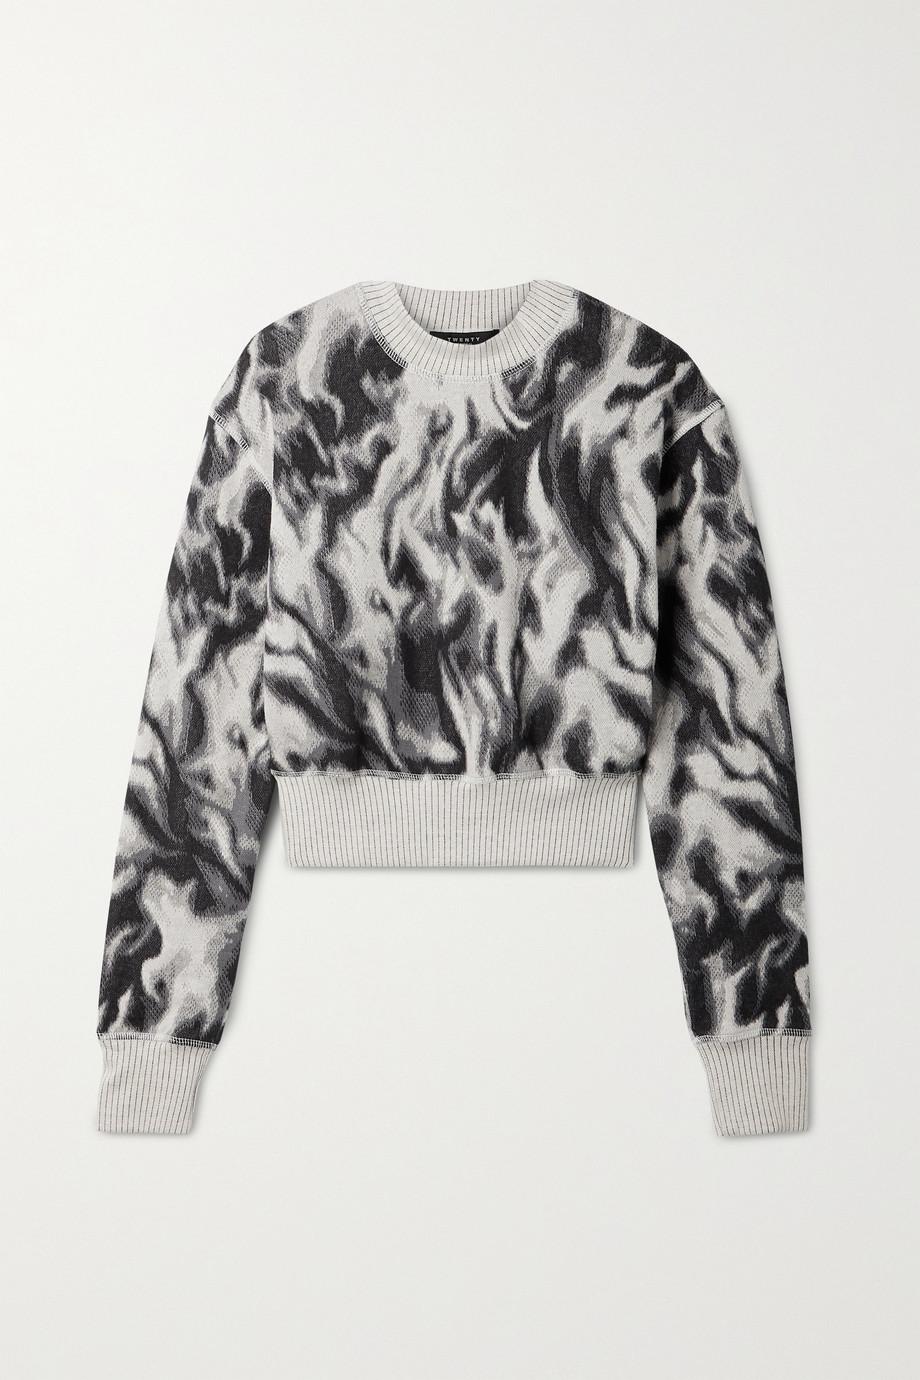 TWENTY Montréal Flames Hyper Reality cropped jacquard-knit cotton-blend sweater